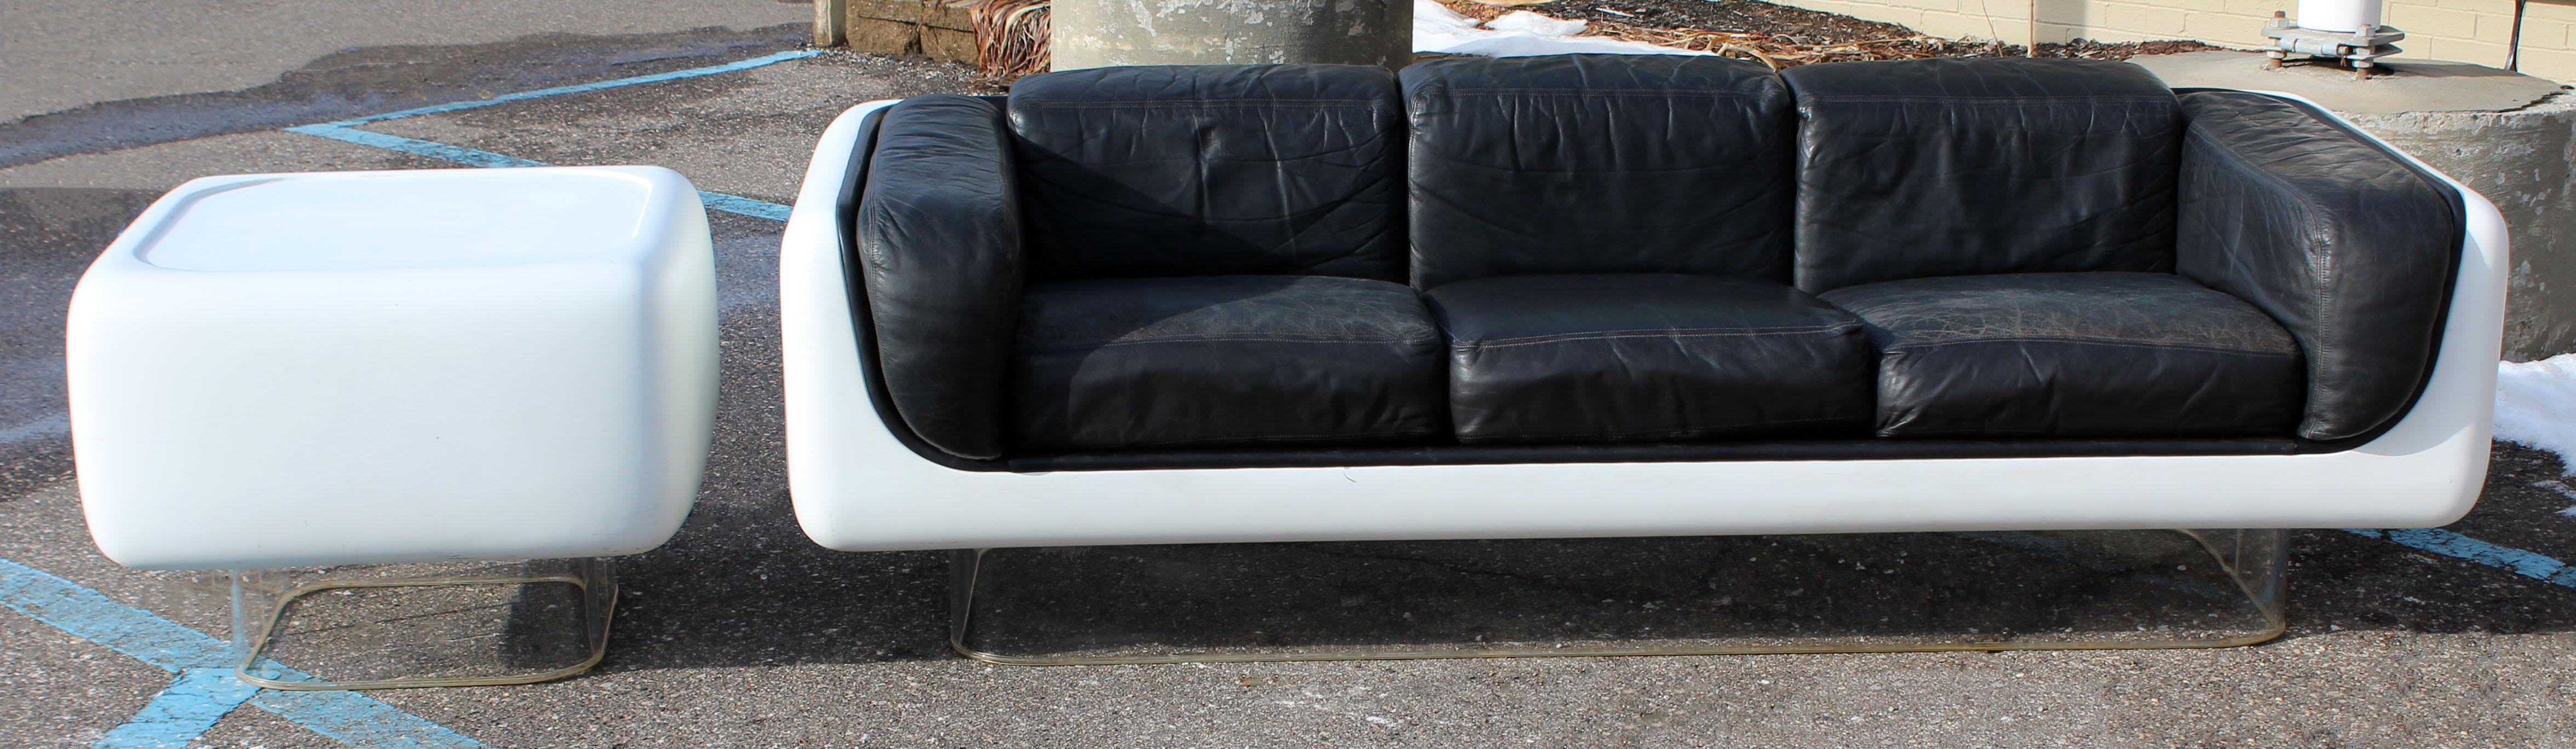 steelcase sofa platner oxford swansea sofascore luxury mid century modern warren fiberglass lucite 1970s end table for sale